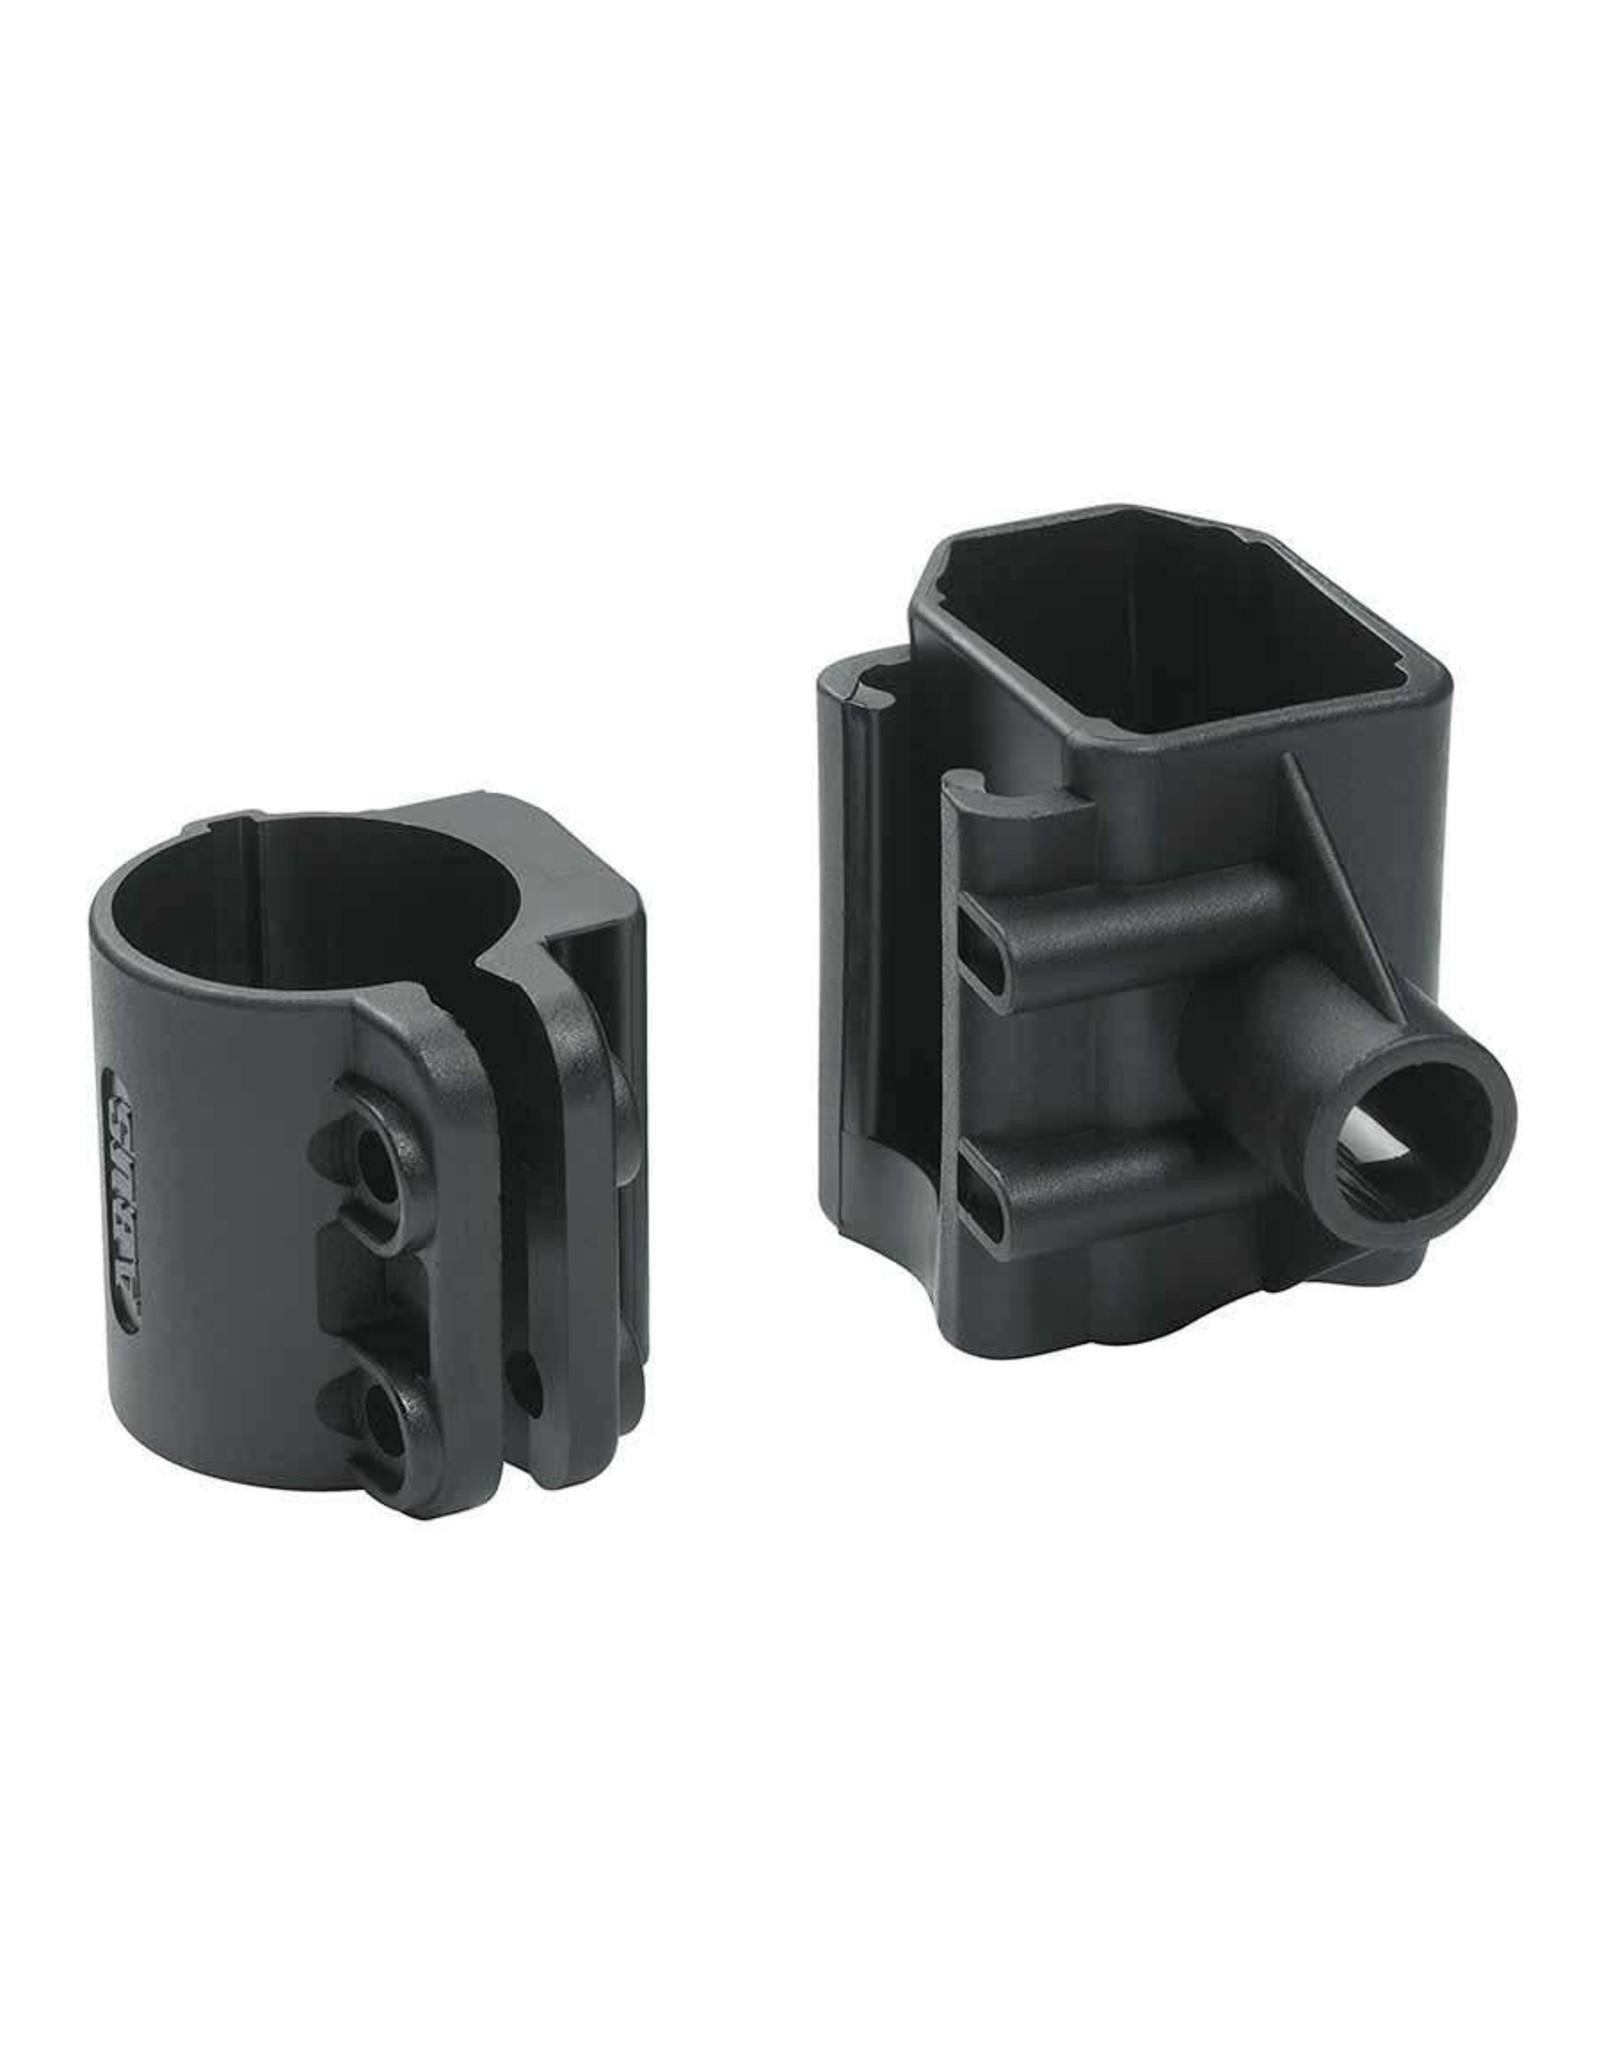 Abus ABUS SUPER ULTIMATE 430, U-shaped padlock